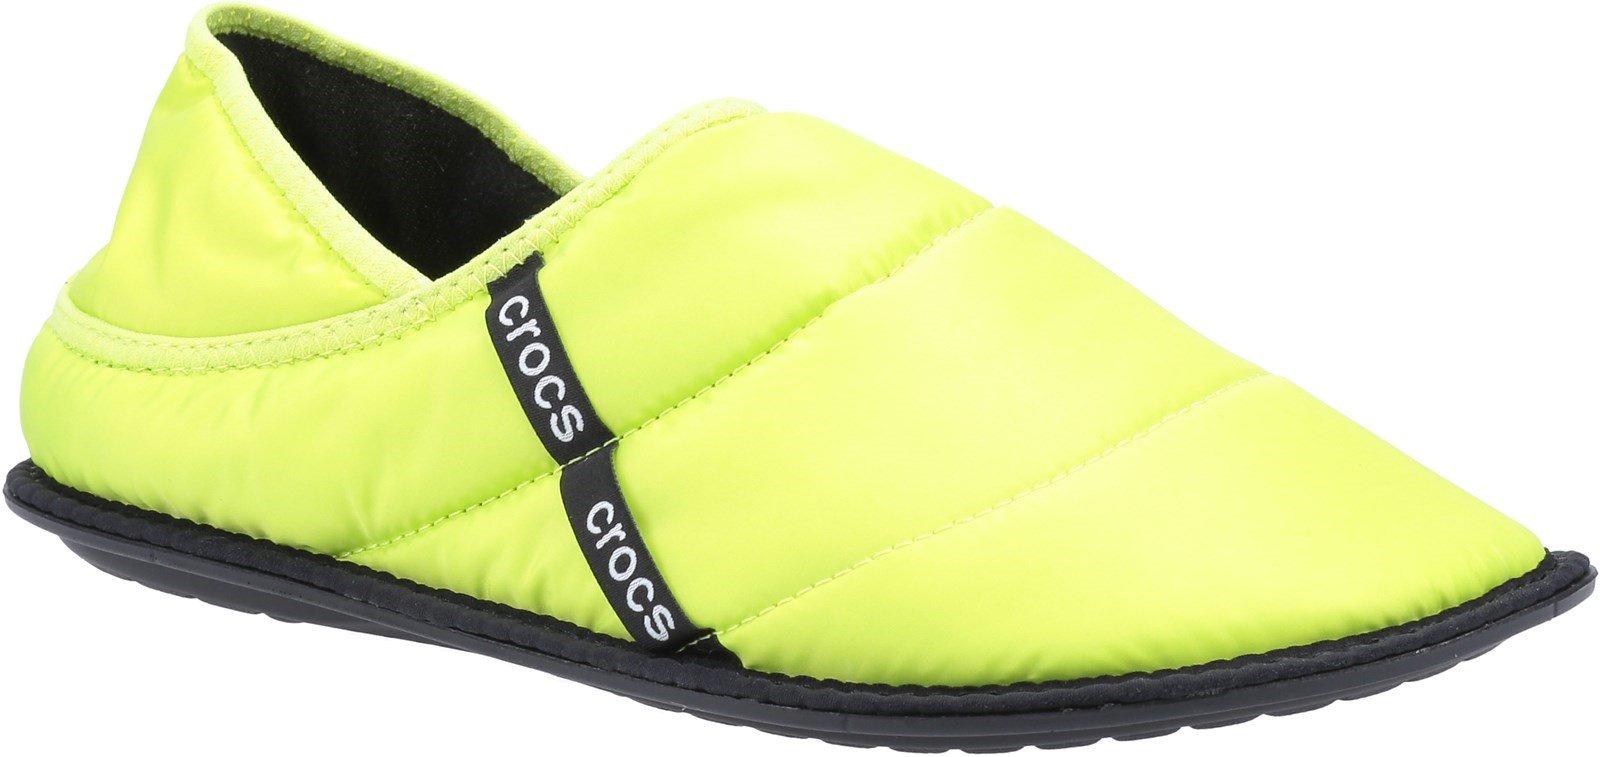 Crocs Unisex Neo Puff Slipper Various Colours 31449 - Lime 3